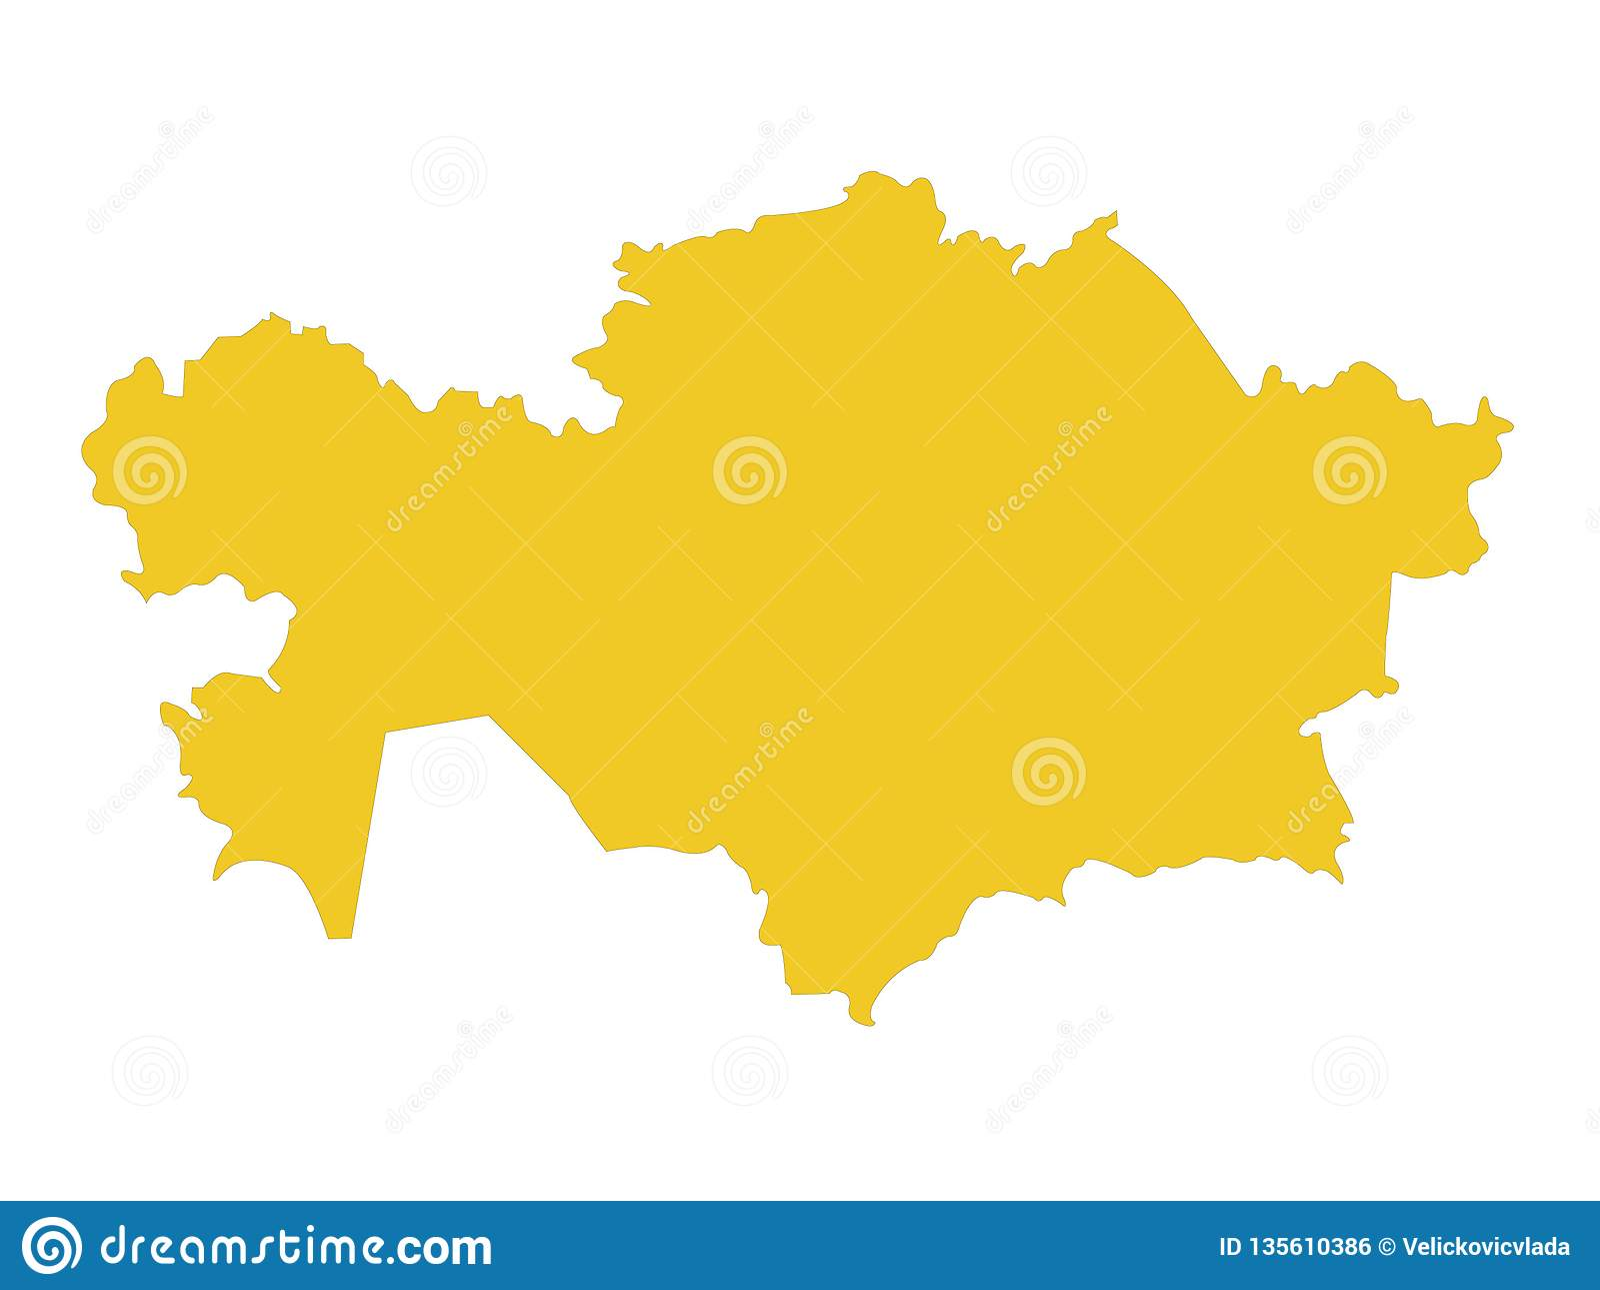 Kazakhstan Map Republic Of Kazakhstan Stock Vector Illustration